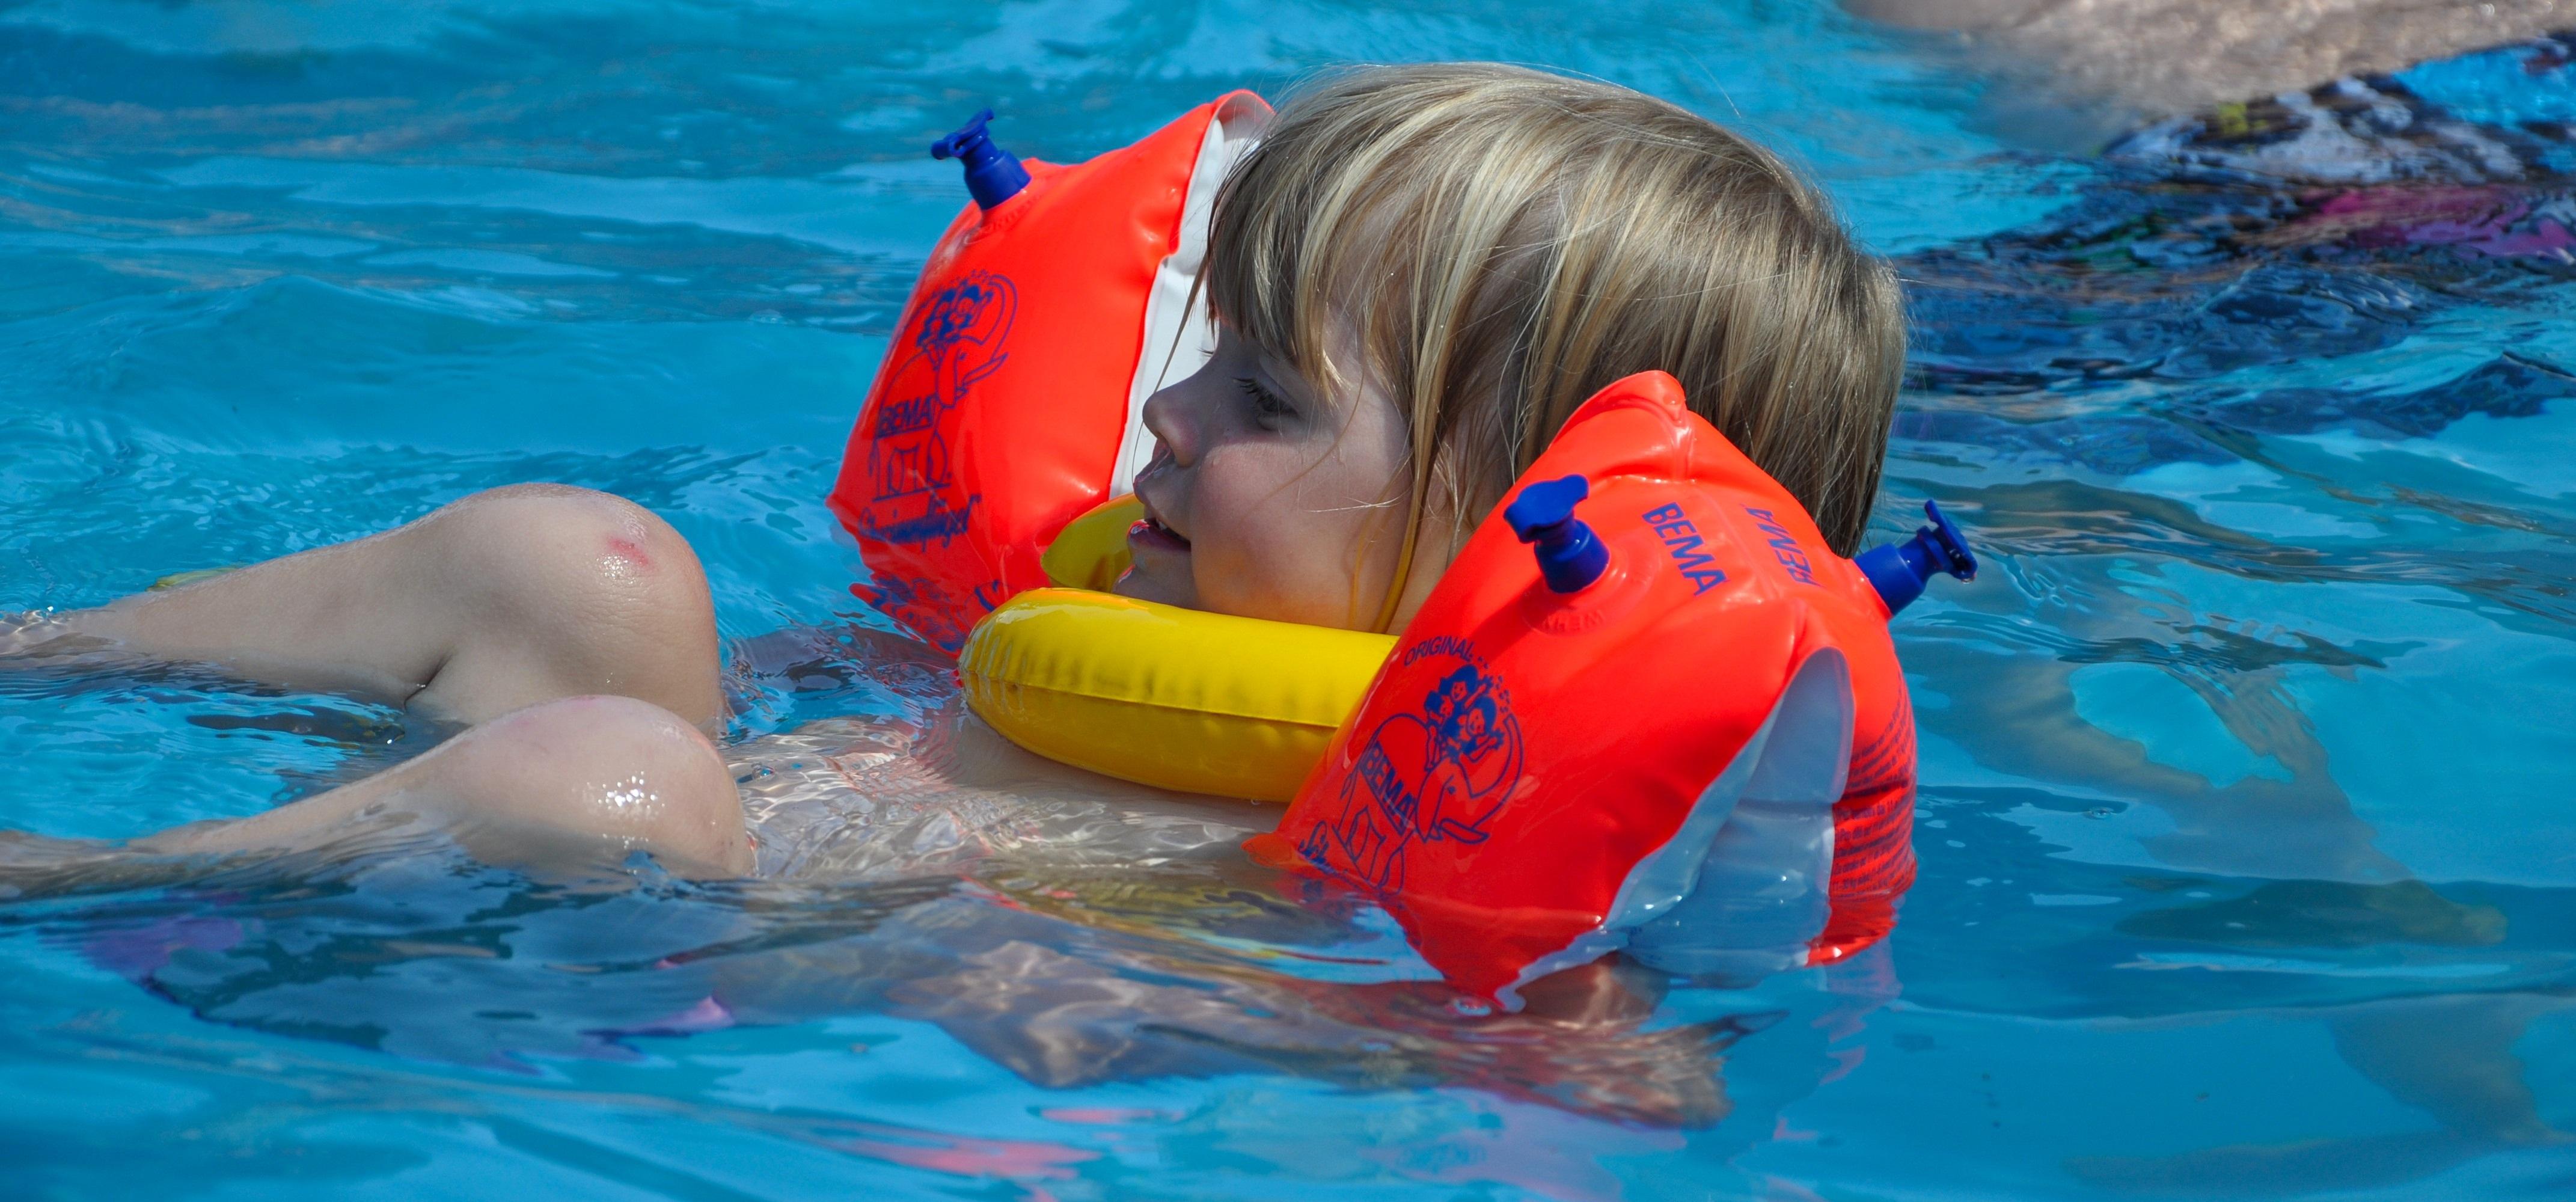 Swimming Pool Wings : Free images girl play swim swimming pool child